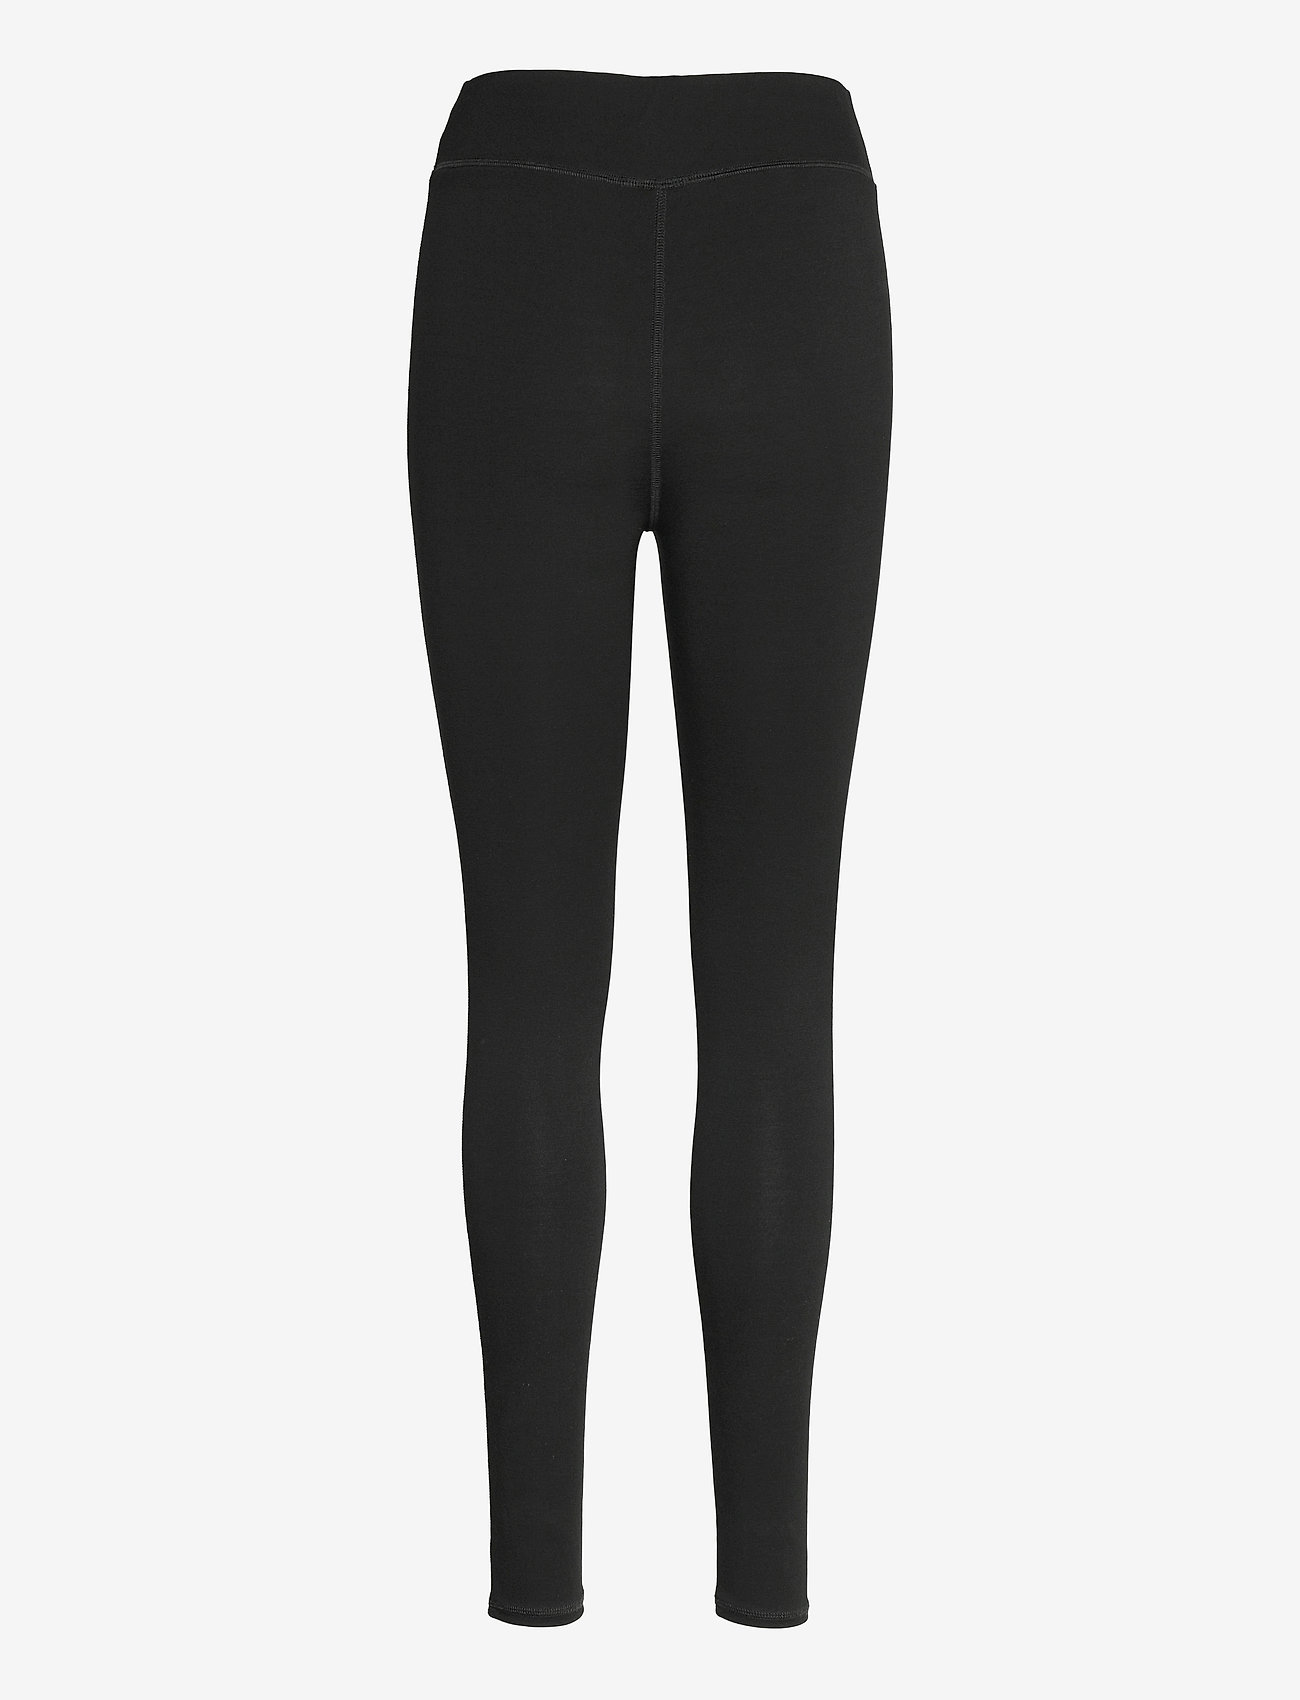 Twist & Tango - Ava Tights - leggings - black - 1